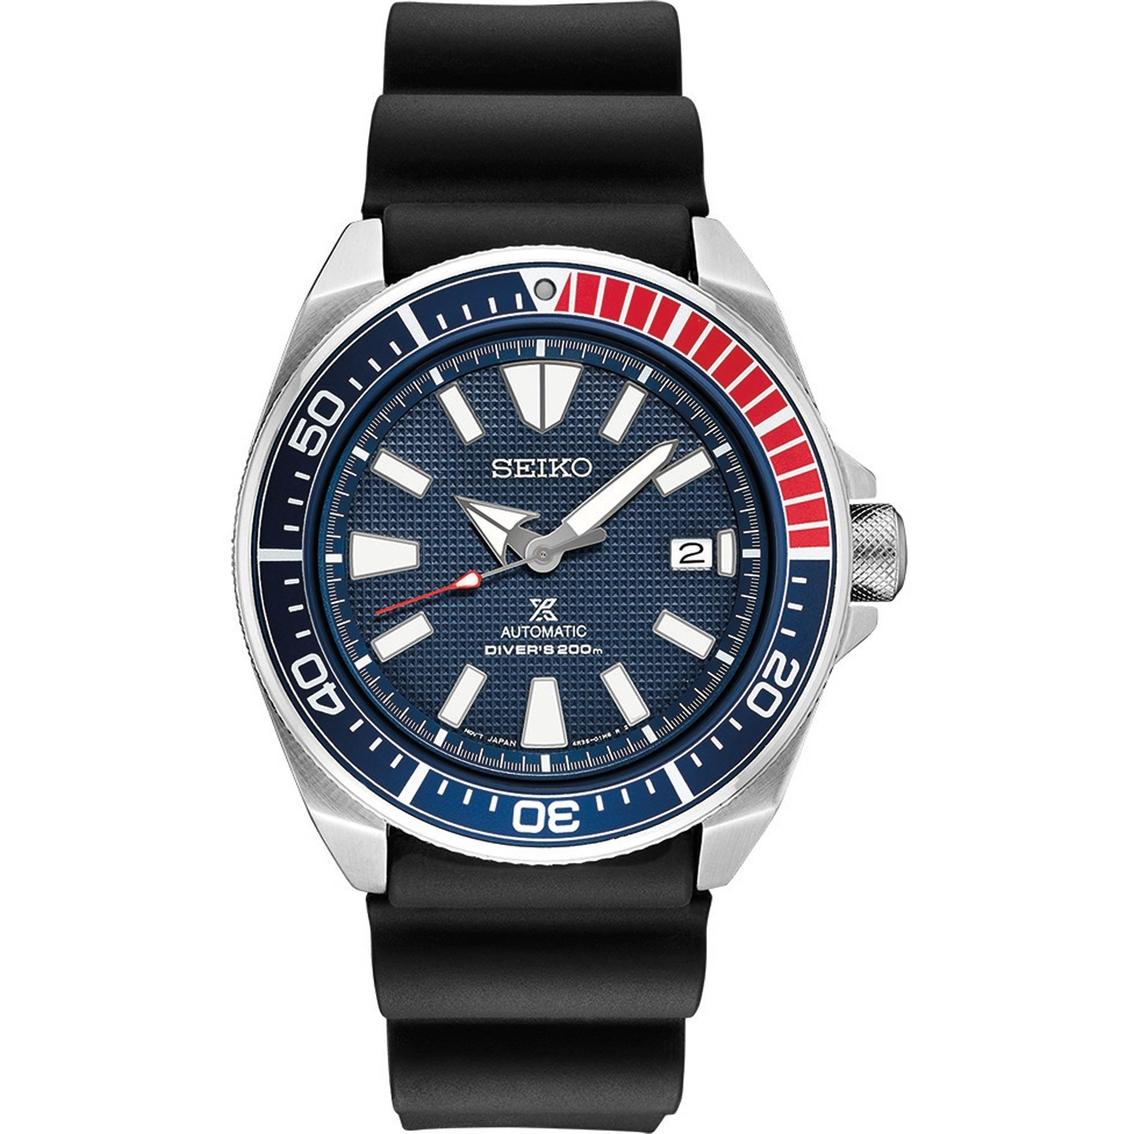 Seiko Men s Special Edition Samurai PADI Prospex Automatic Diver Watch  SRPB53 88c80419cc